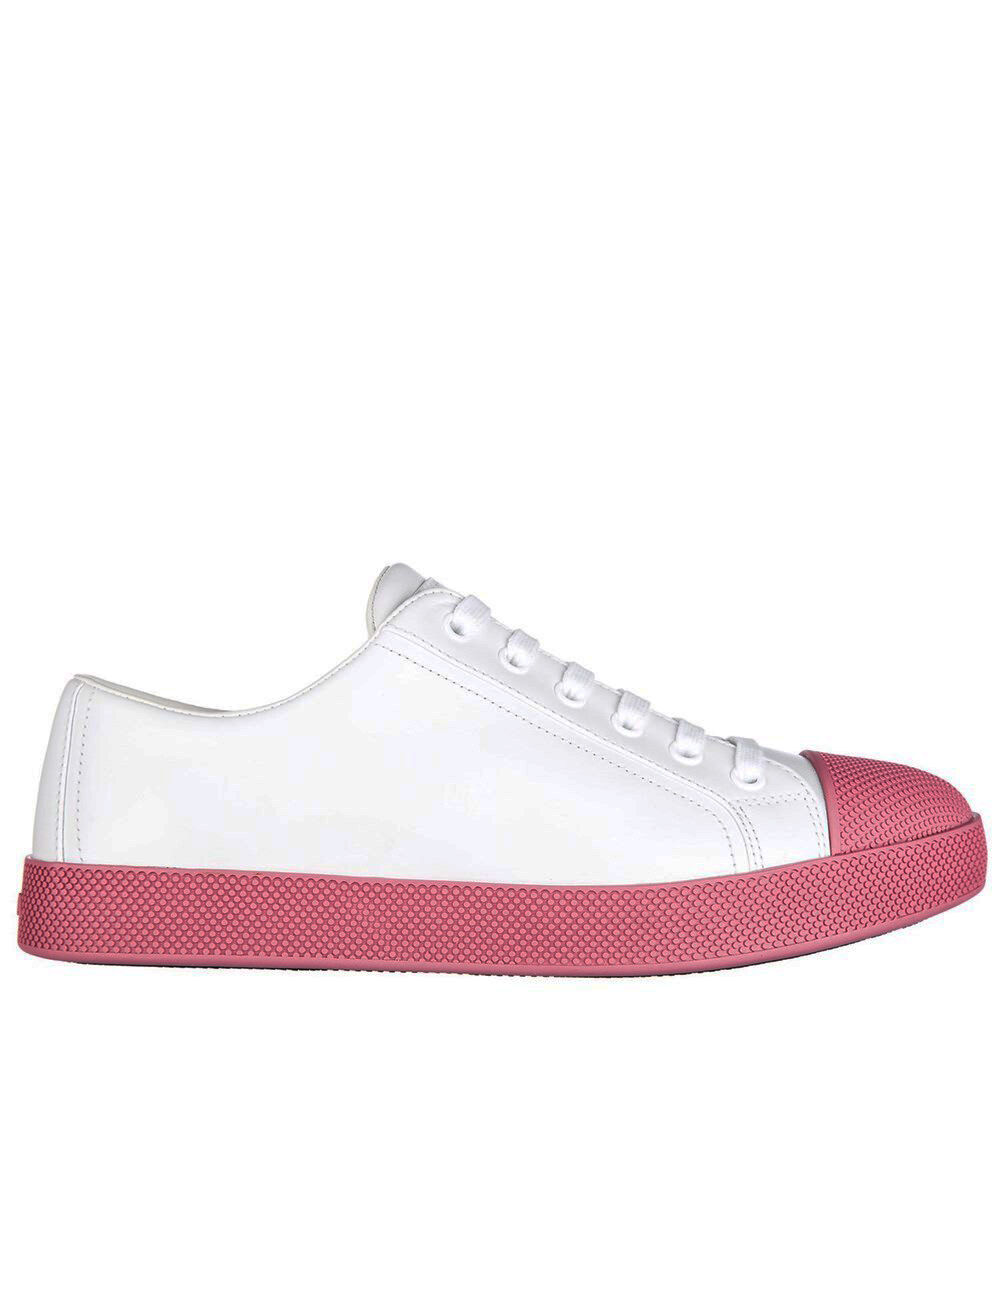 Le scarpe  da tennis di PRADA DONN velvet ____ 100%AUT.SC7  nuovo stile